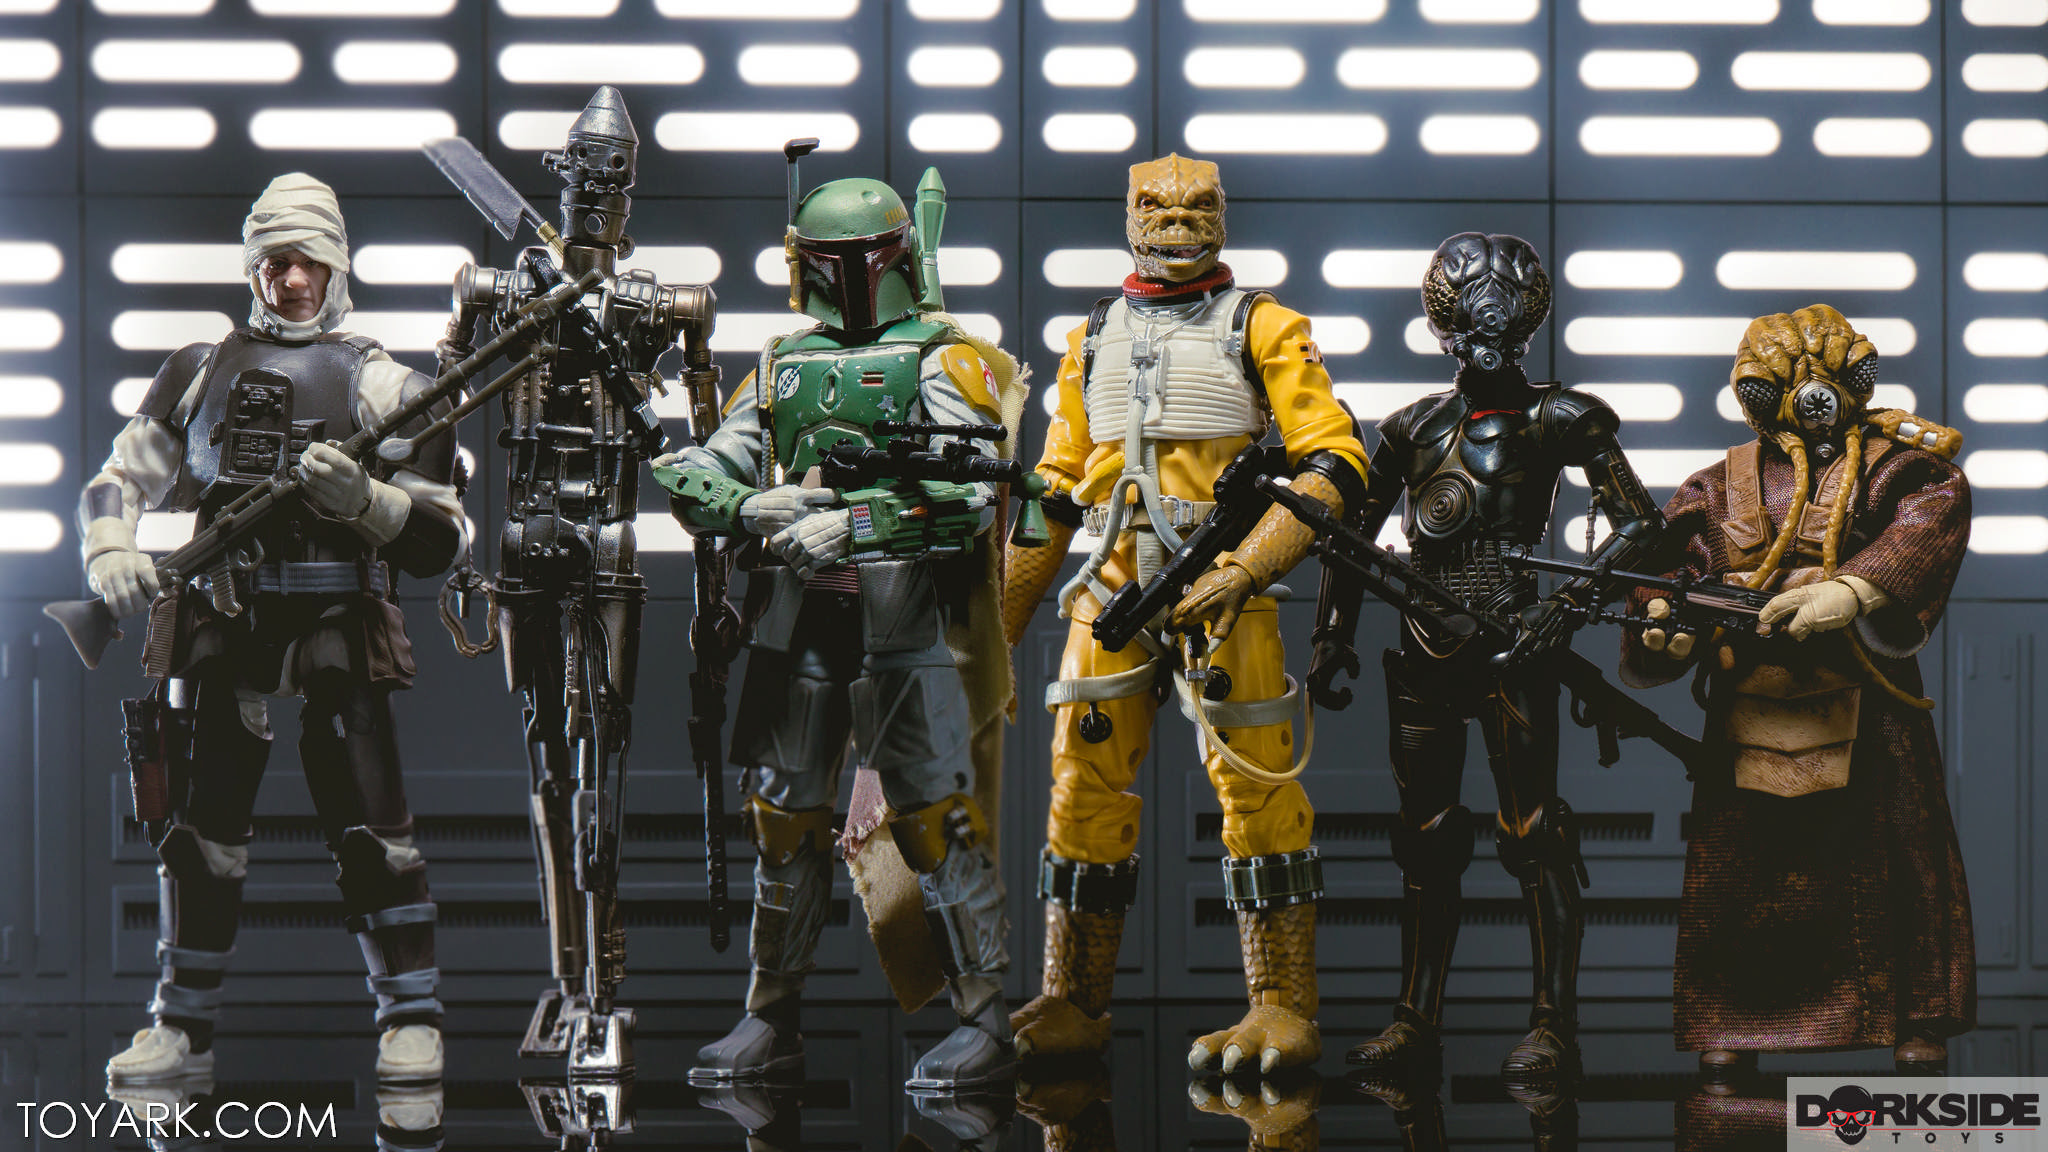 Star Wars Black Series Zuckuss And Dengar Gallery Bounty Hunters